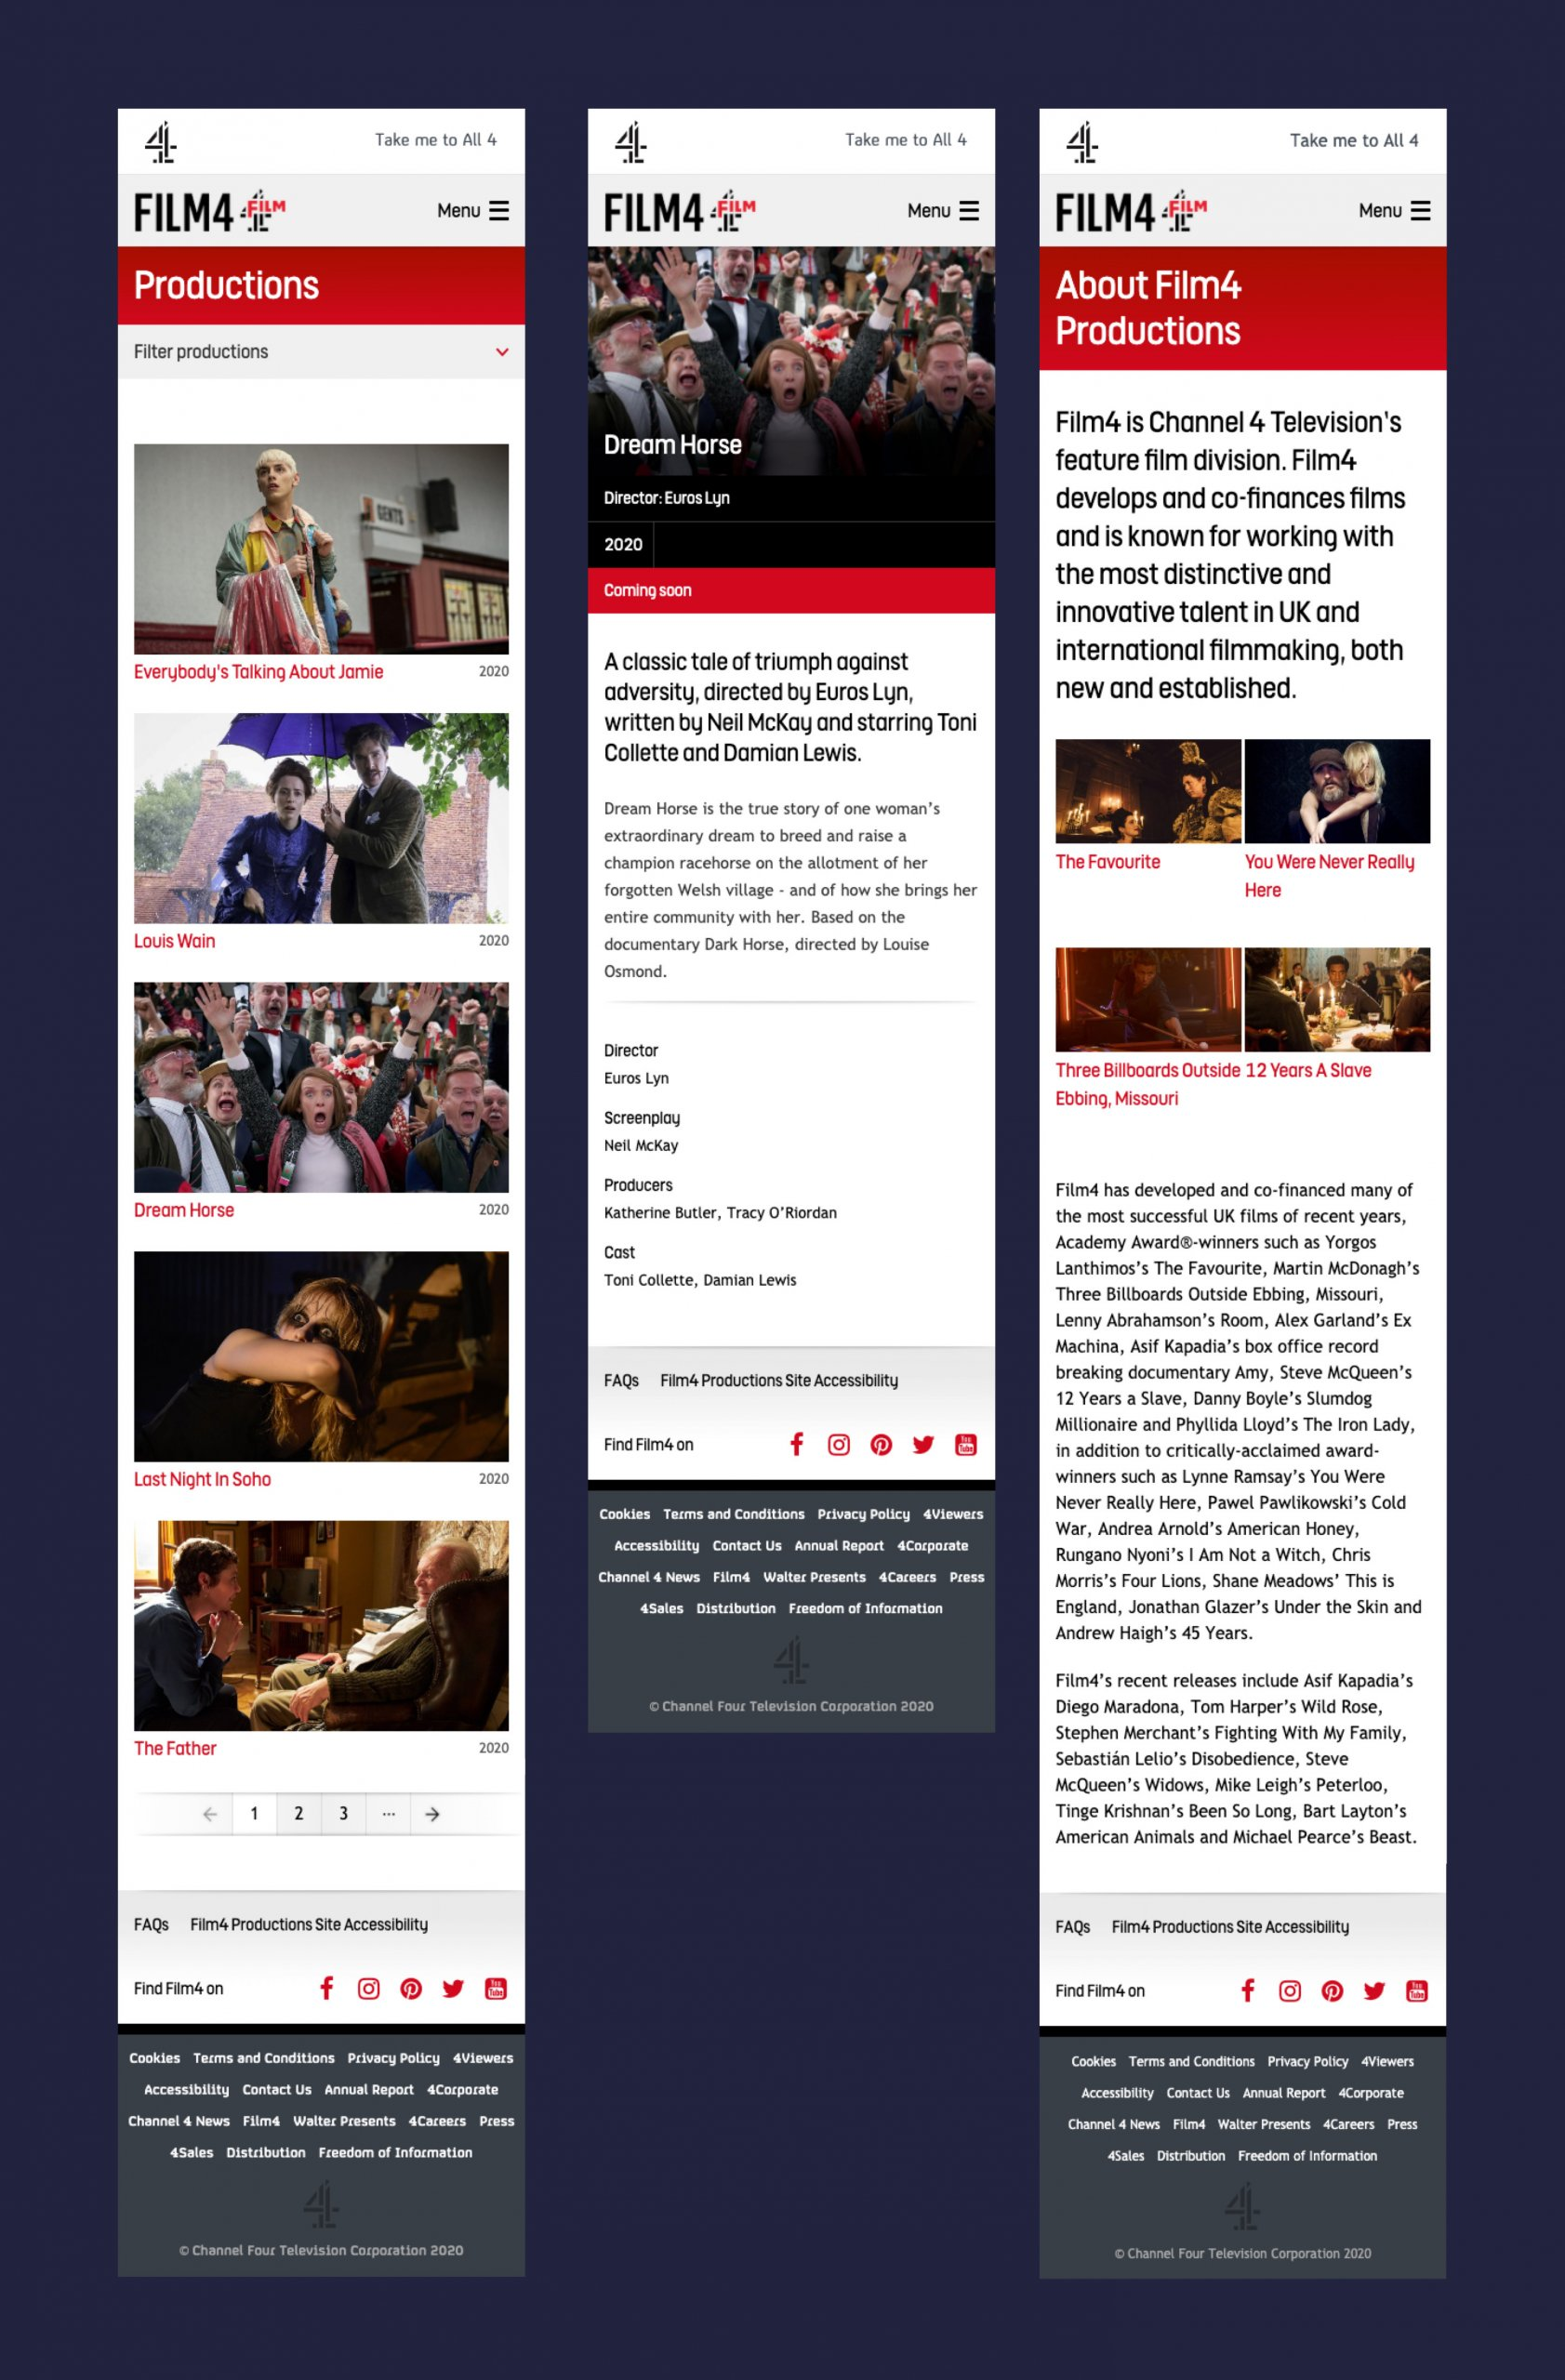 Screengrabs of the Film4 website